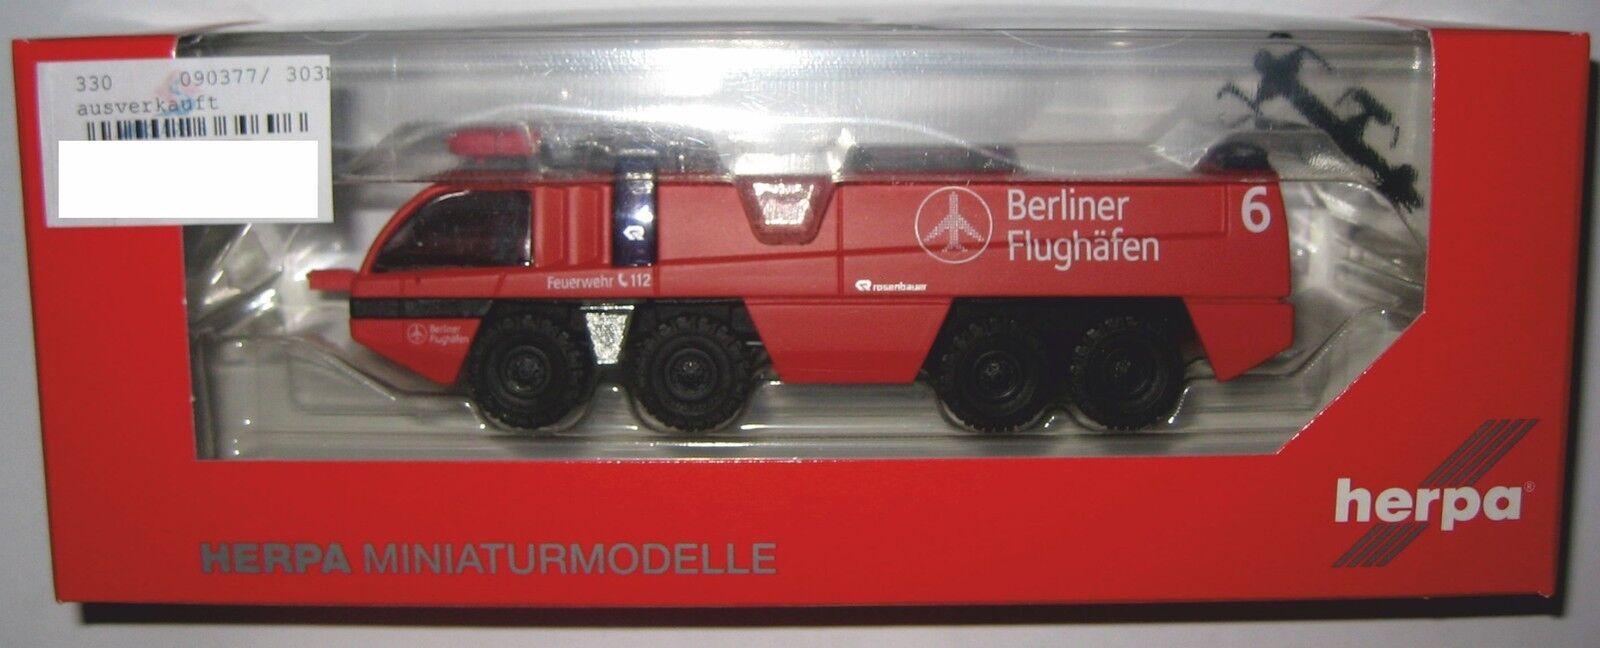 Herpa 090377 roses Bauer Design Panther Aéroport Pompiers Berlin 1 87 HO